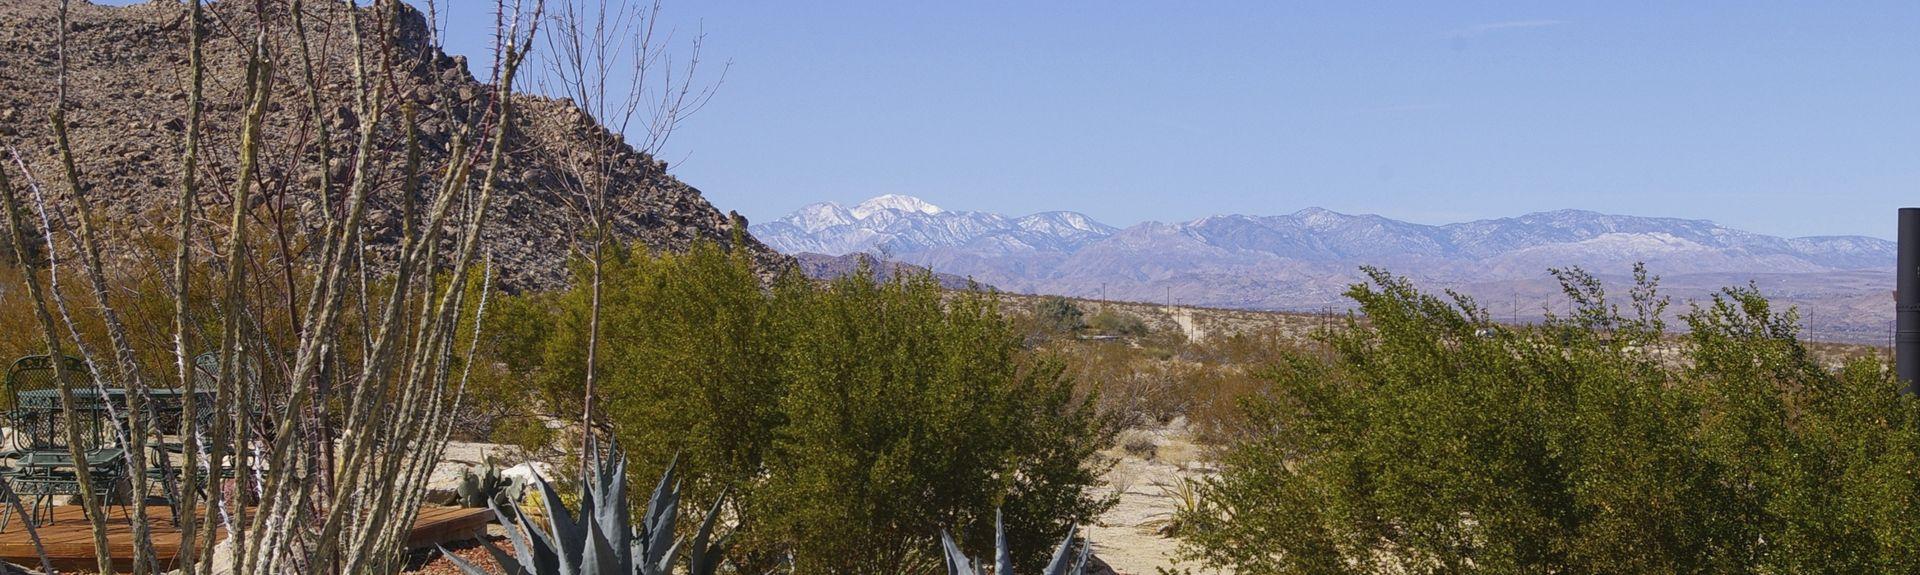 Twentynine Palms, CA, USA